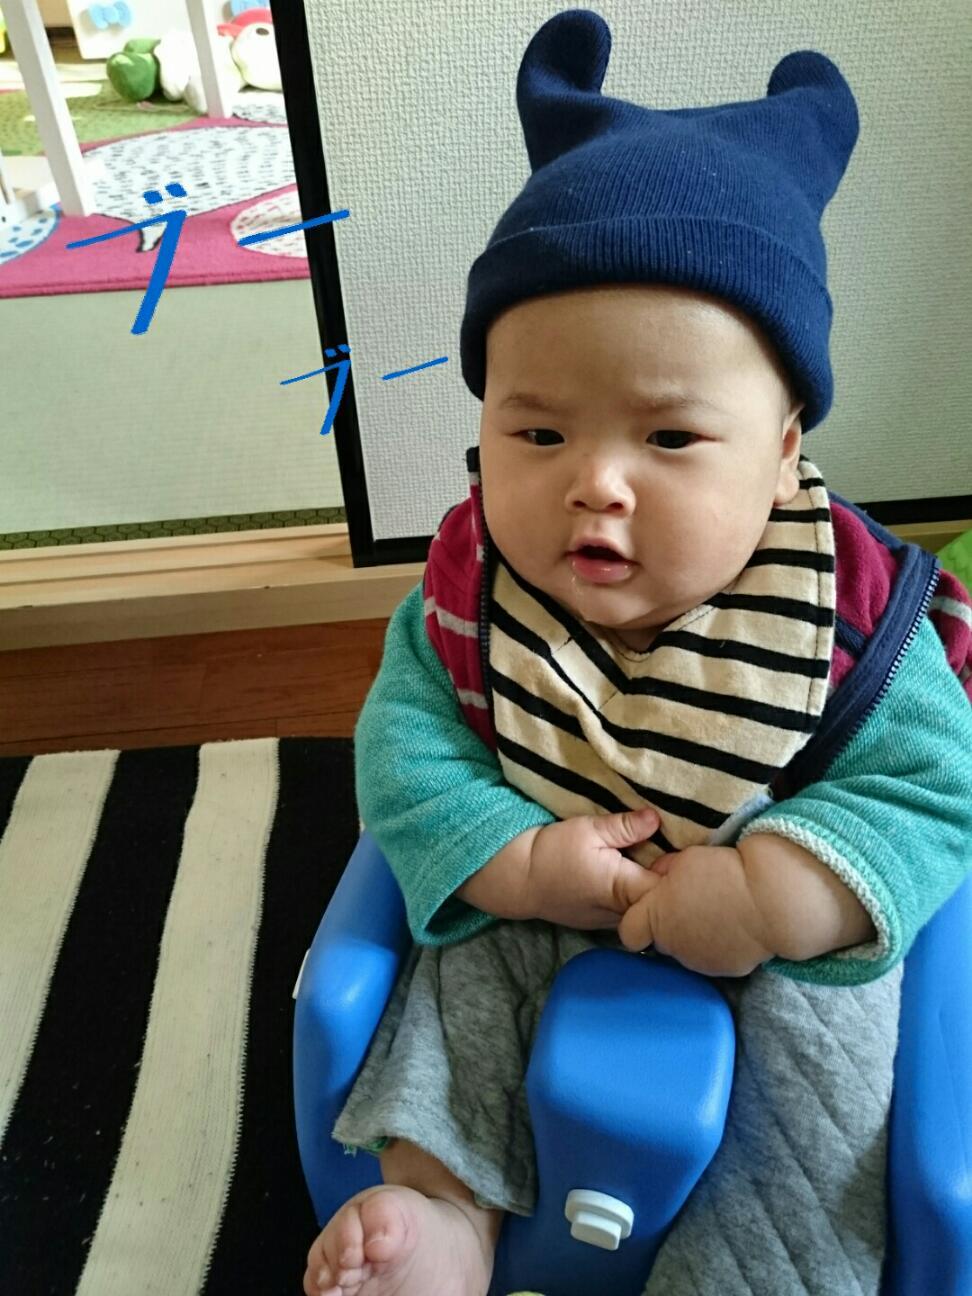 rakugaki_20151226135302044_zed20151226_135850_90p.jpg